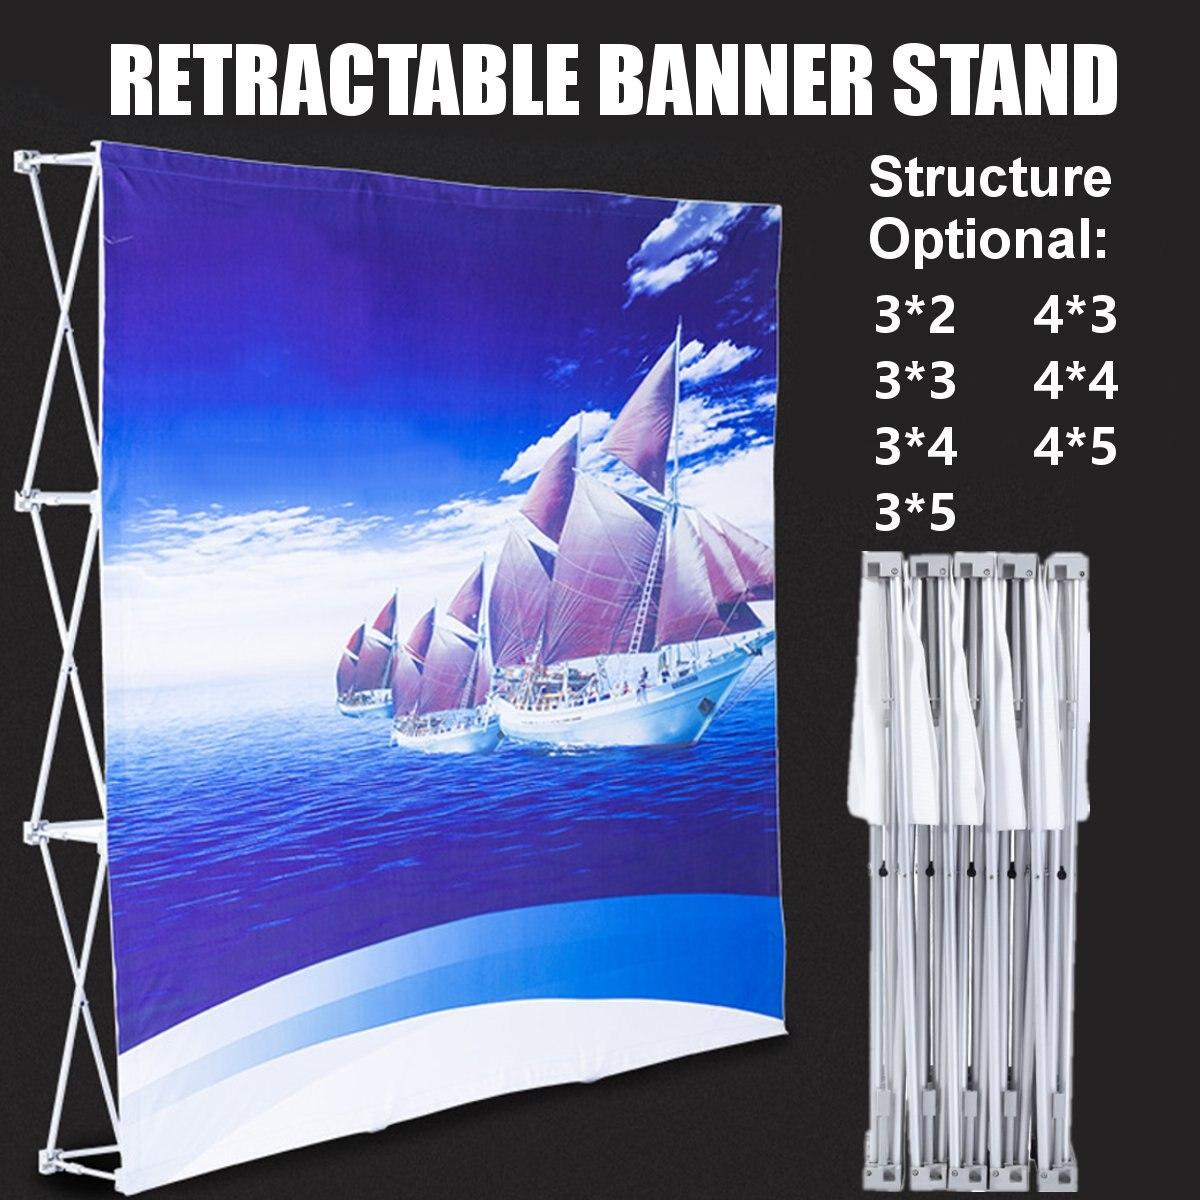 Aluminum Alloy Display Banner Stand Retractable Nylon Display Banner Stand Paste Stand Flower Wall Frame Backdrop Banner Rack